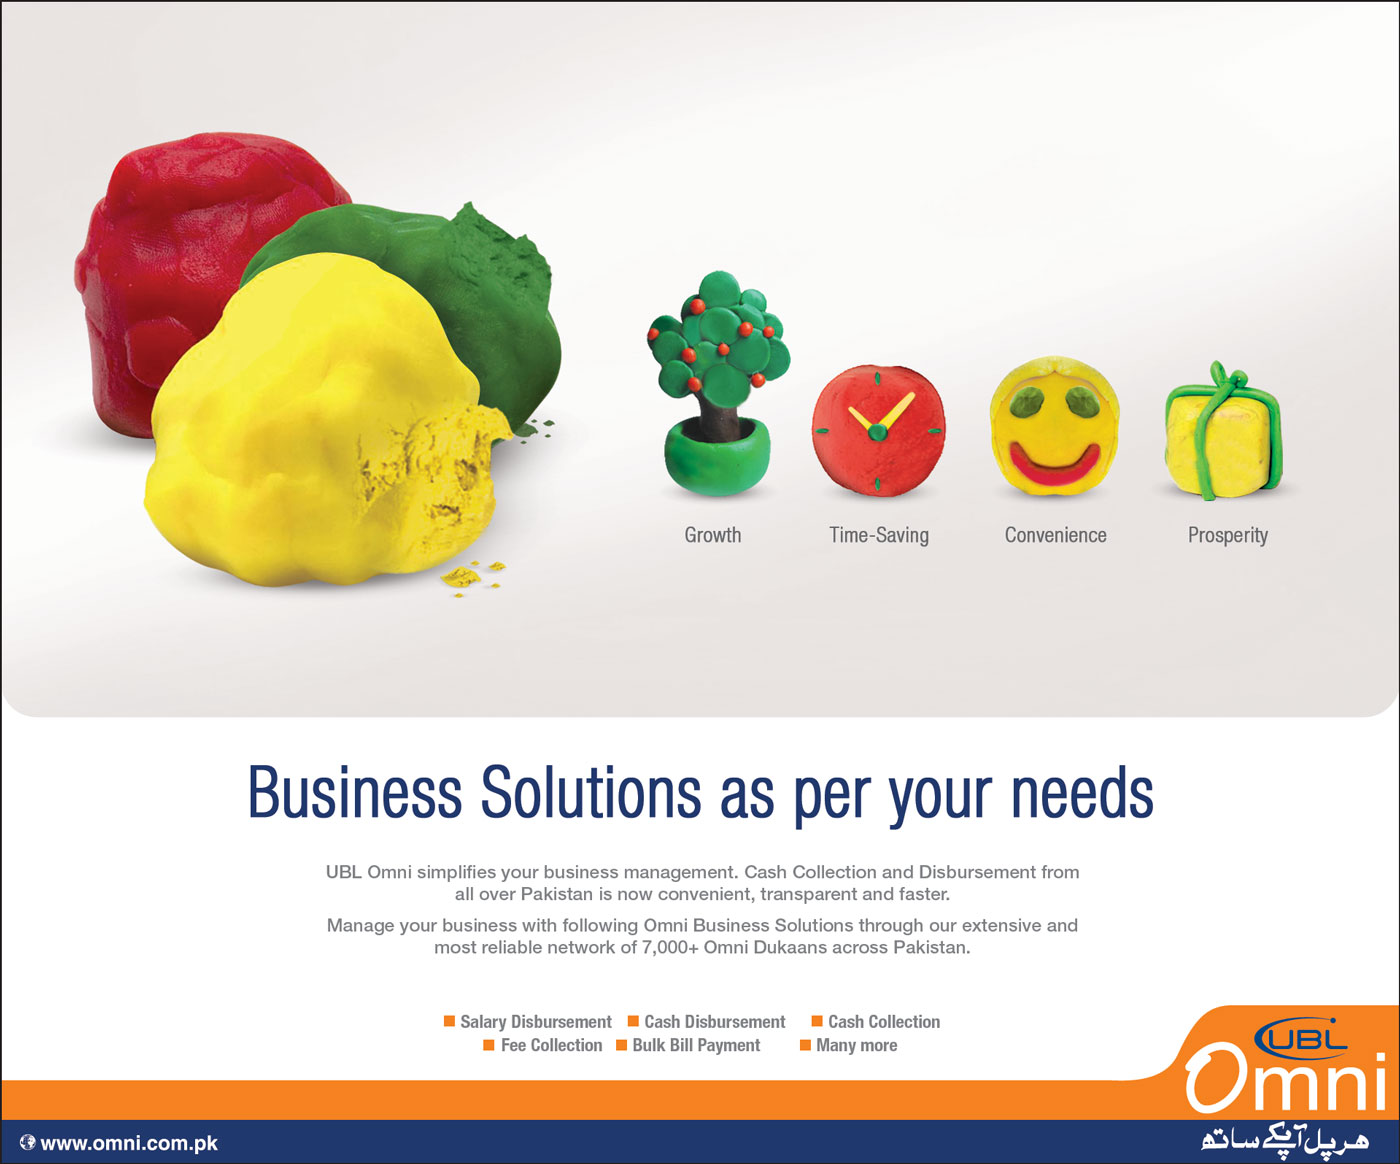 UBL Omni Print Ads